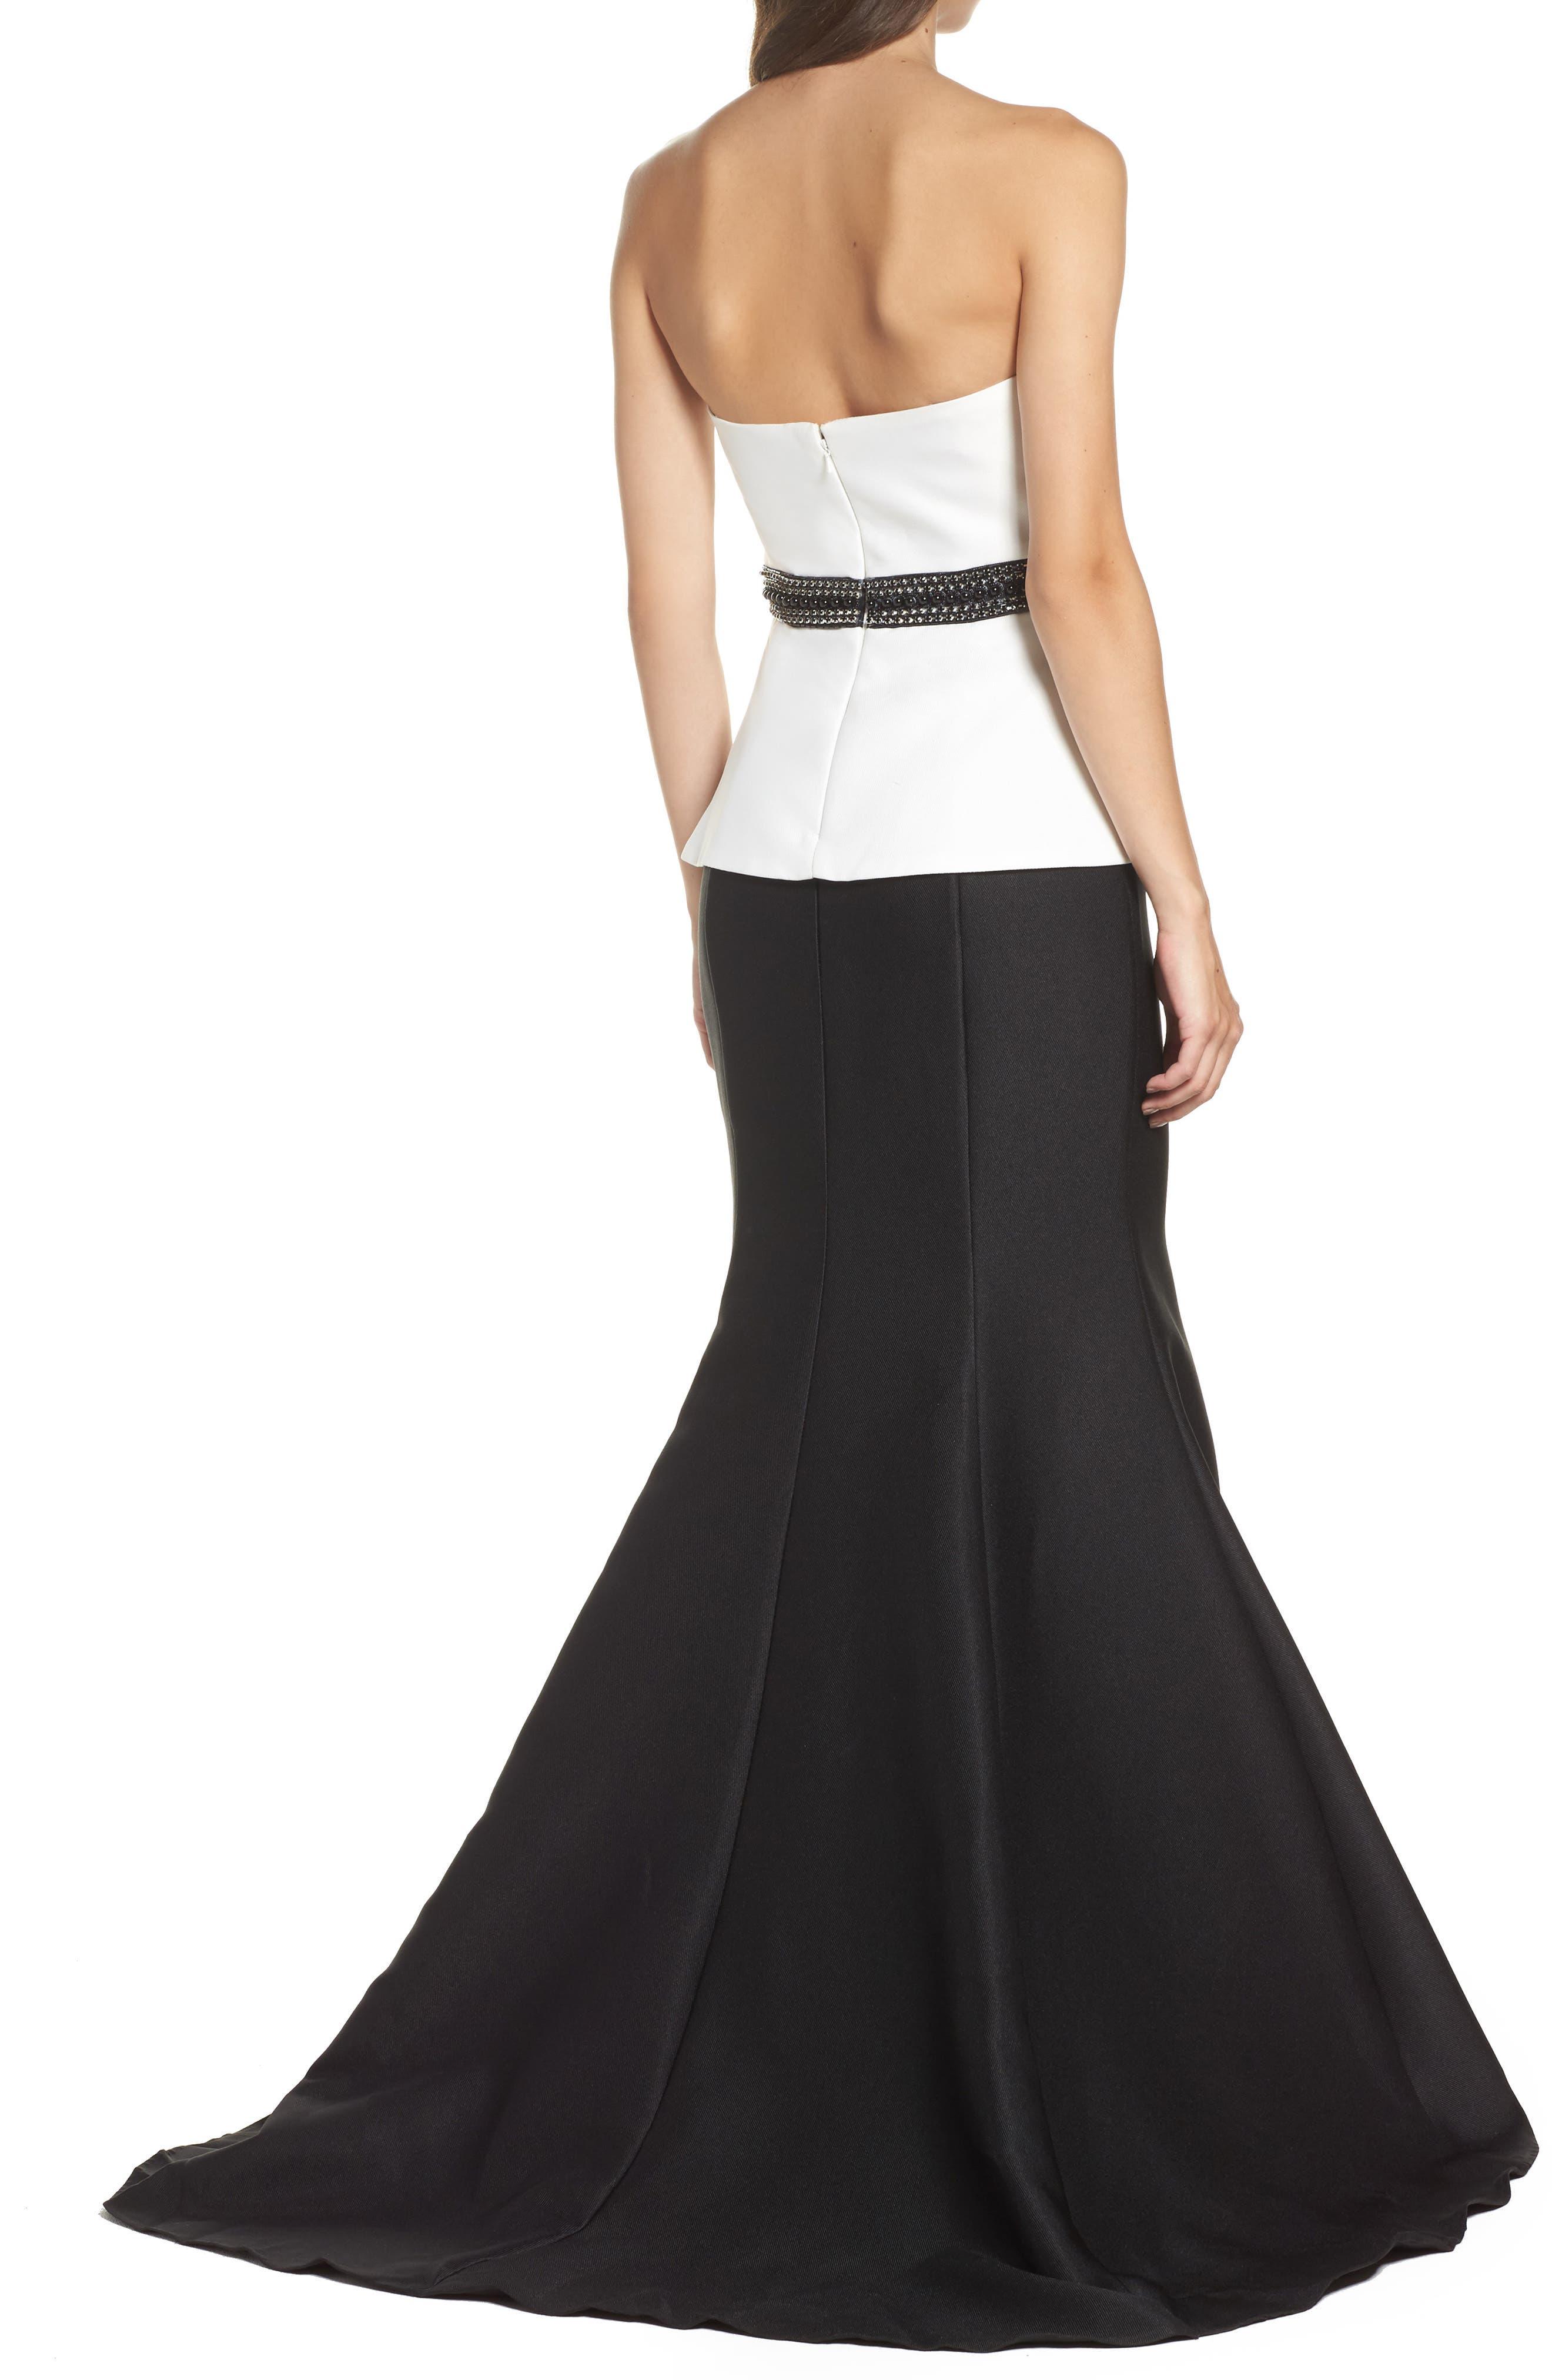 Color Block Strapless Mermaid Gown,                             Alternate thumbnail 2, color,                             Black/ White